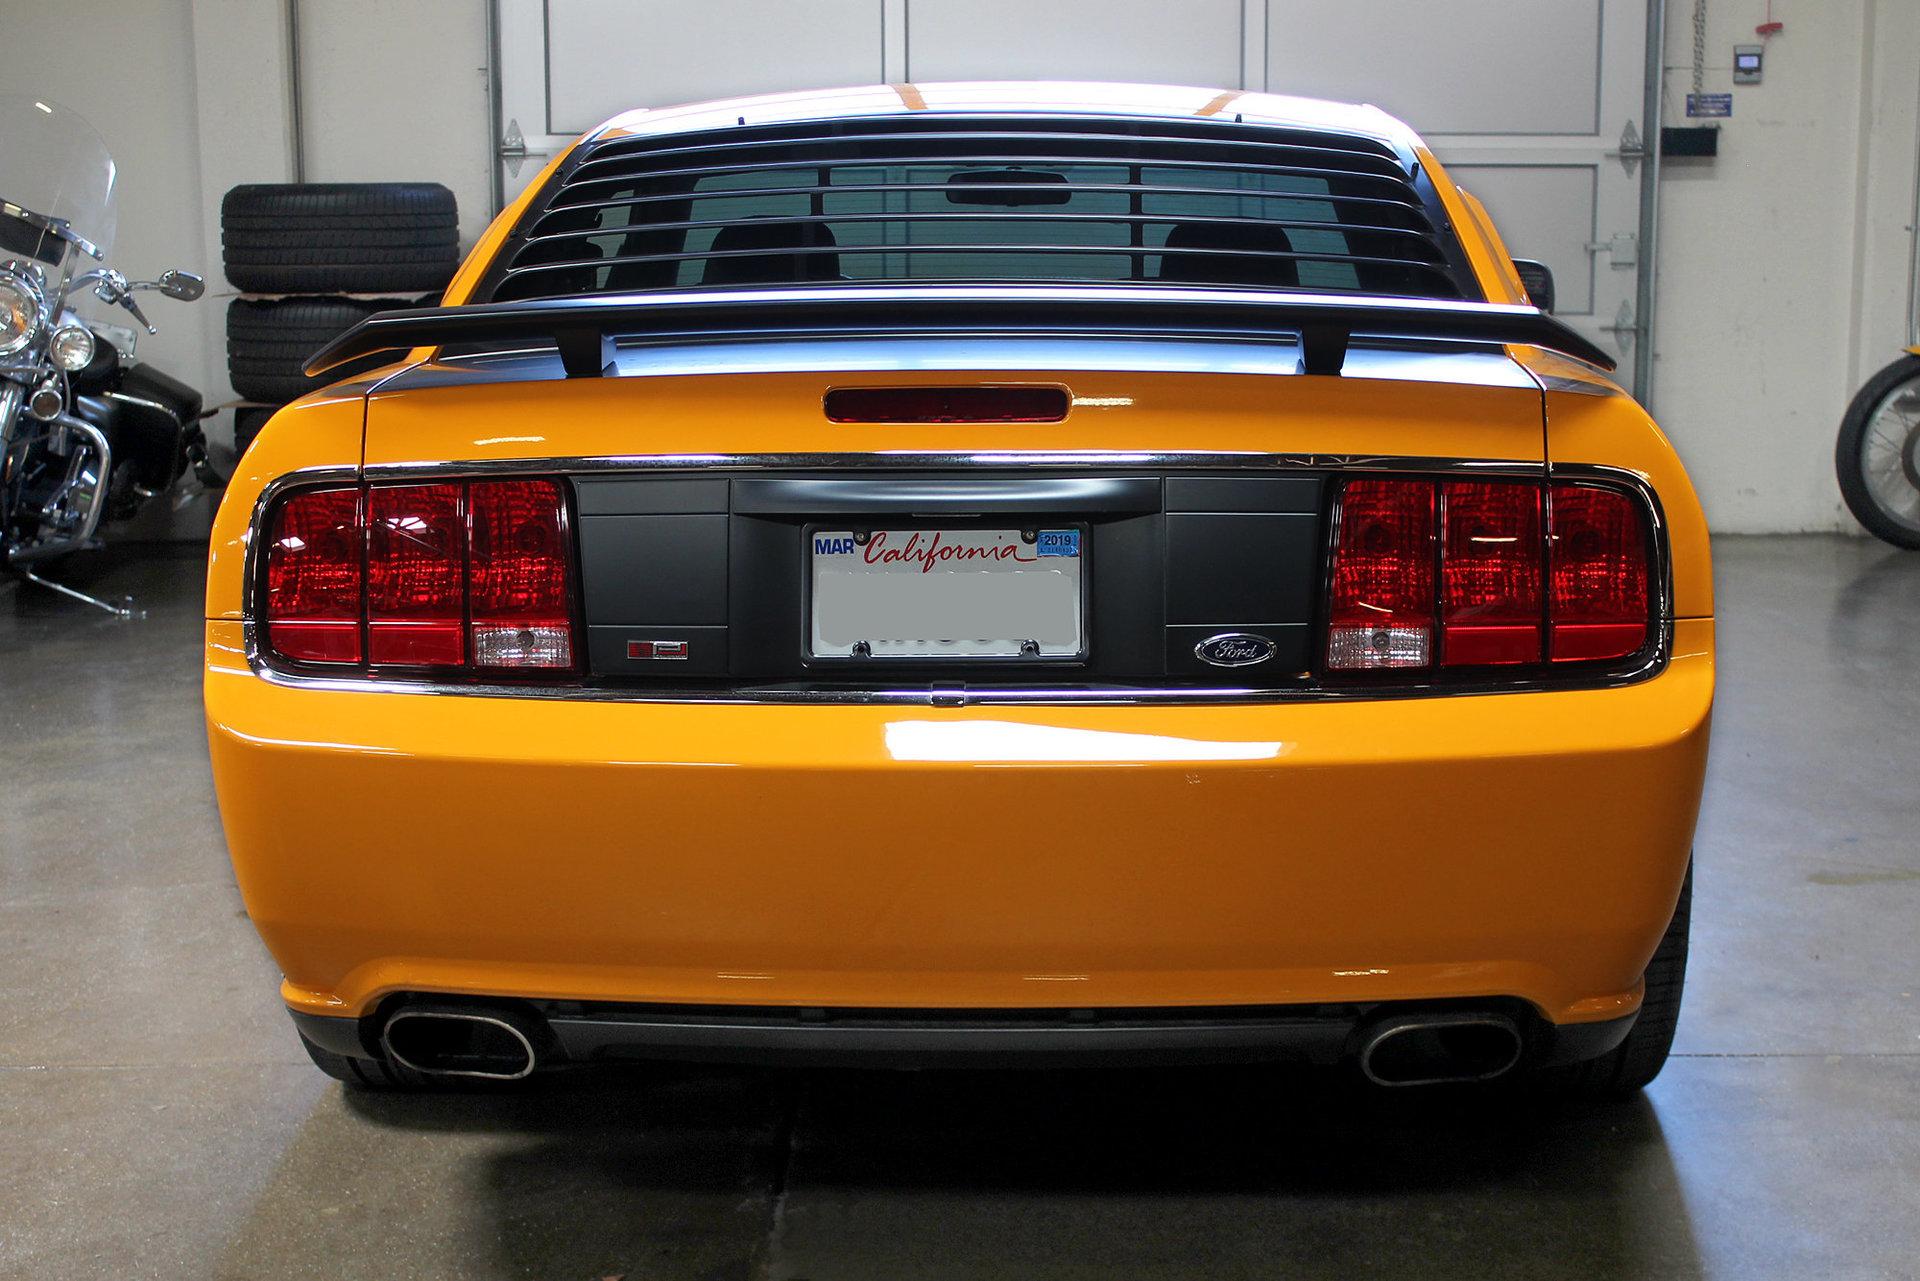 2007 Ford Mustang Boss 302 Saleen Pj For Sale 83967 Mcg